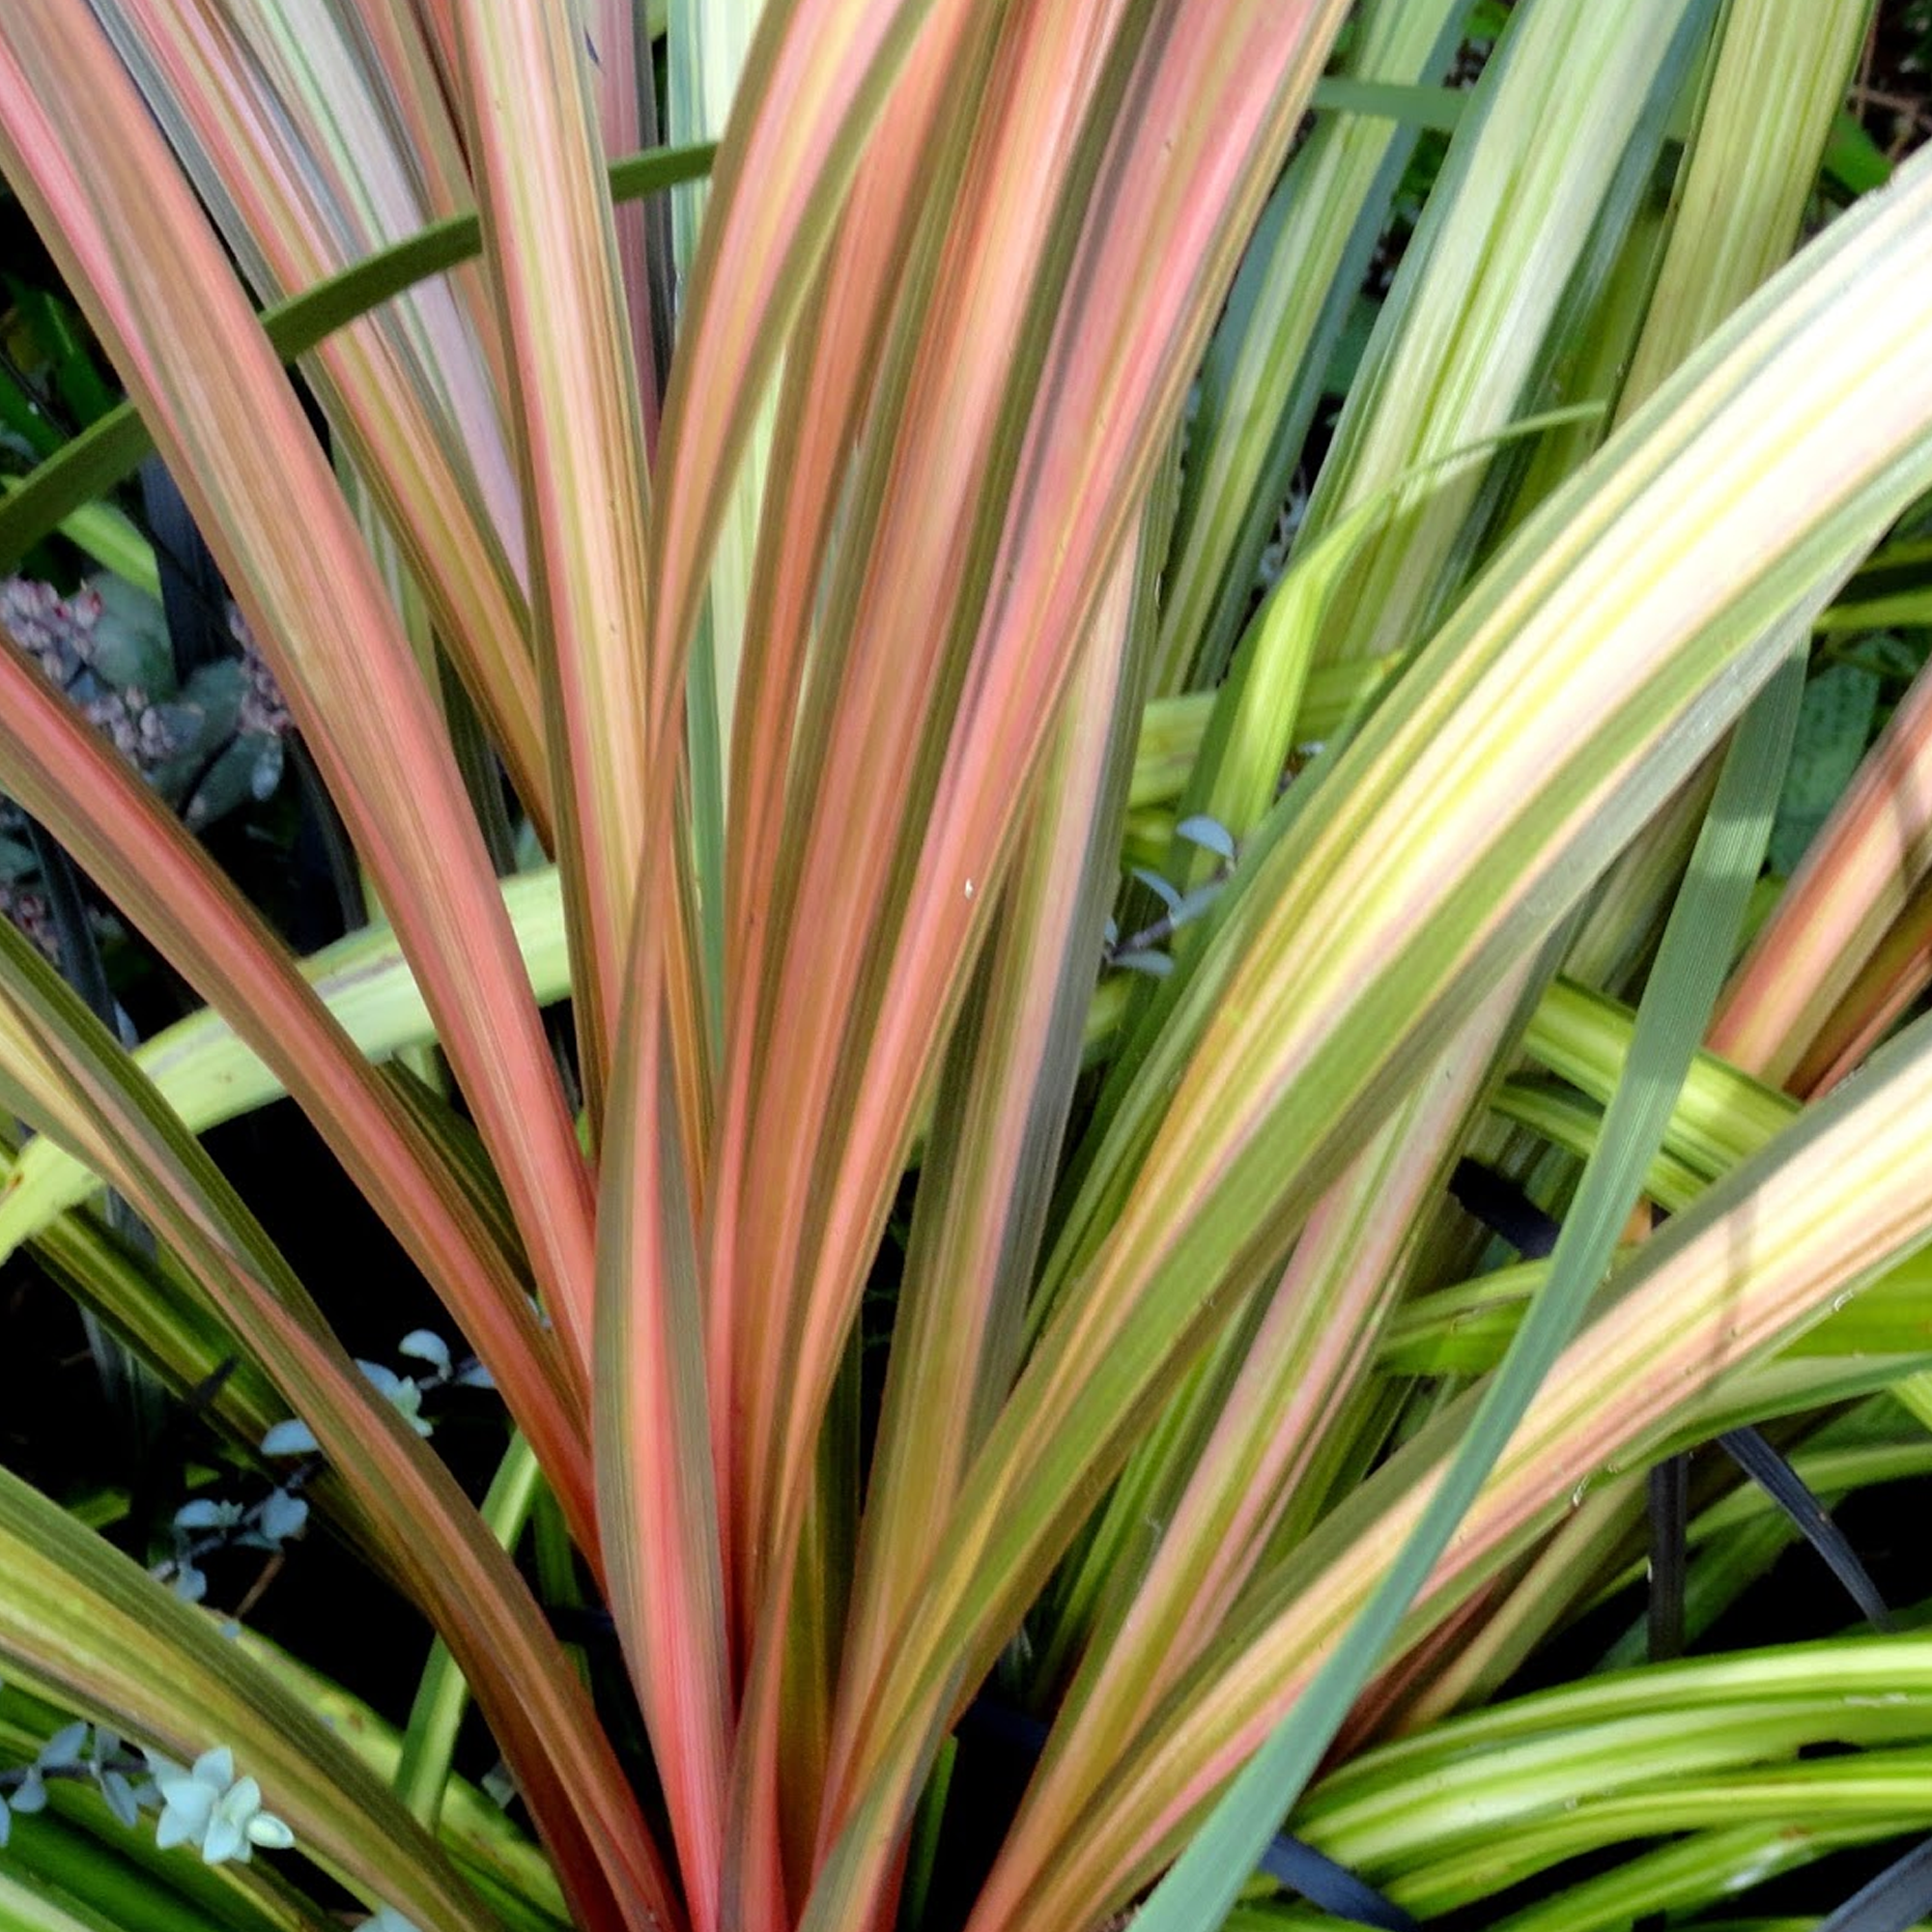 Cordyline Australis Large Plug Plants x 3 Evergreen Shrub Cabbage Palm